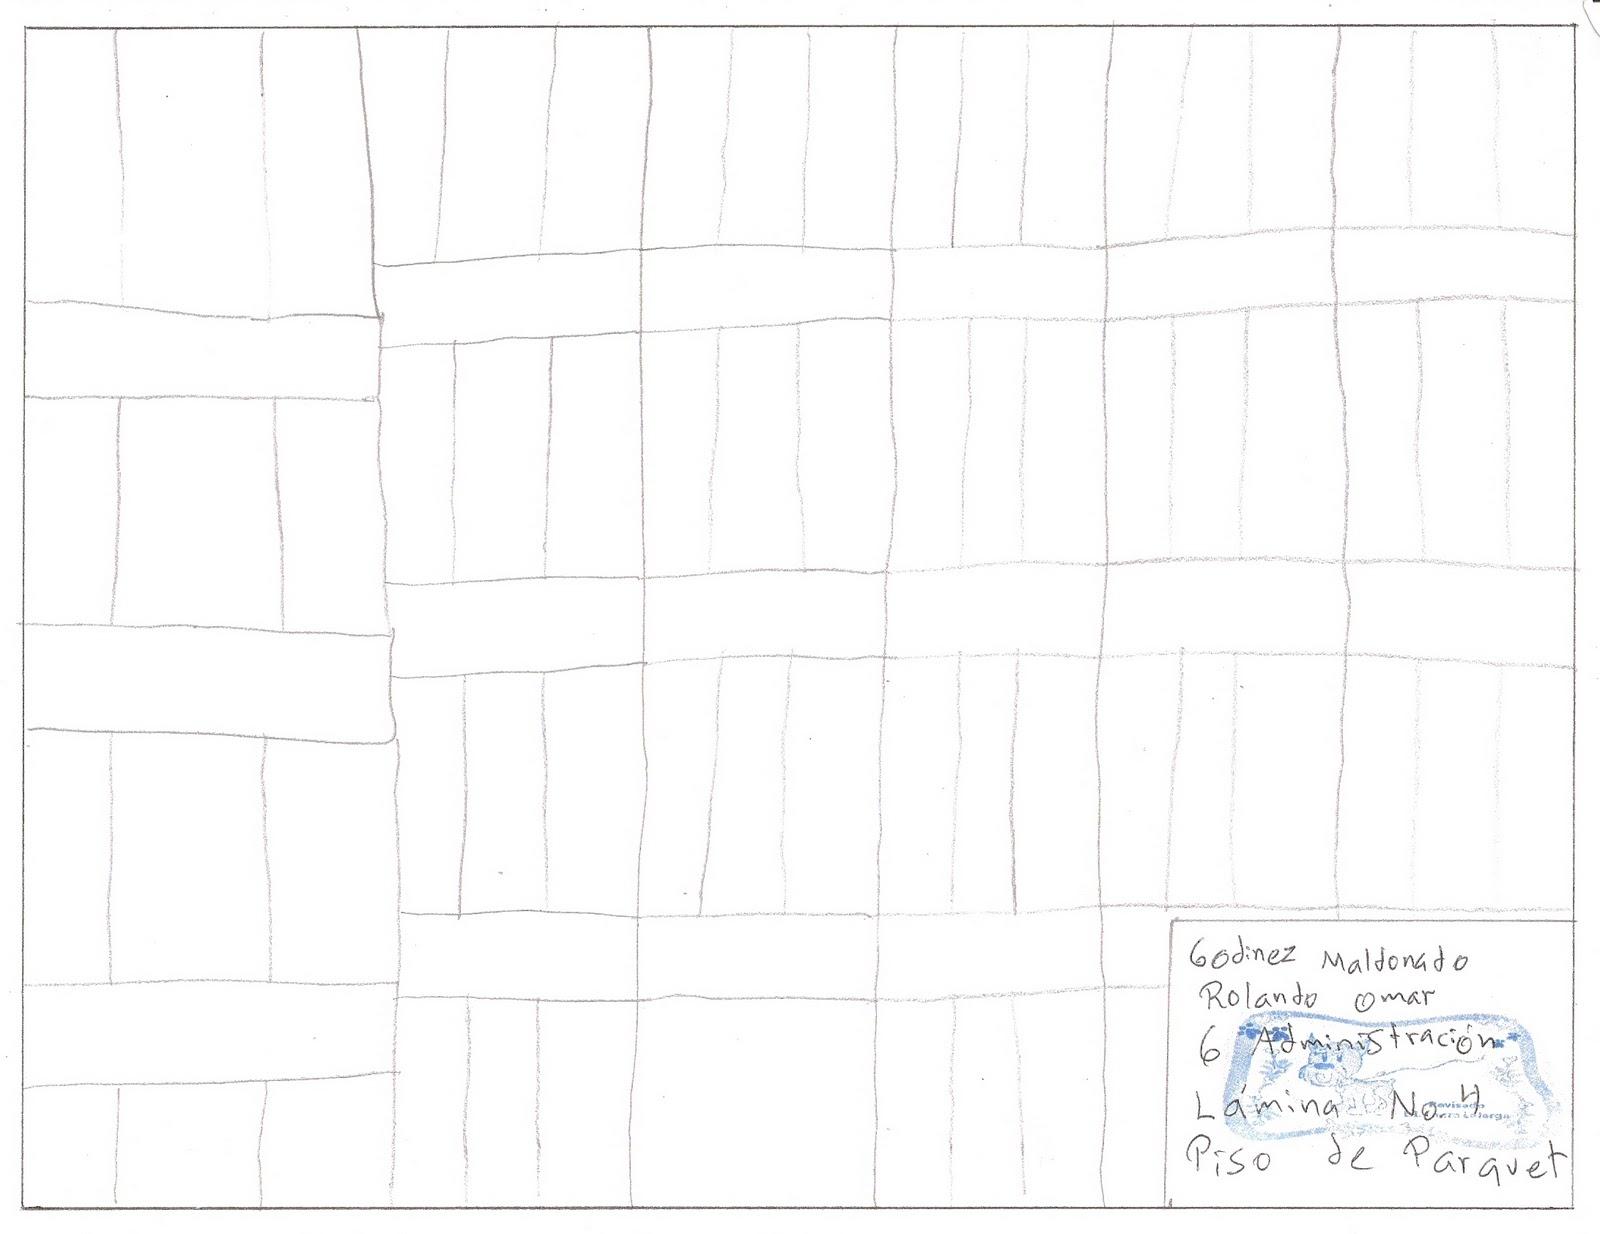 Dibujo tecnico admon l mina 4 piso de parquet - Laminas de parquet ...